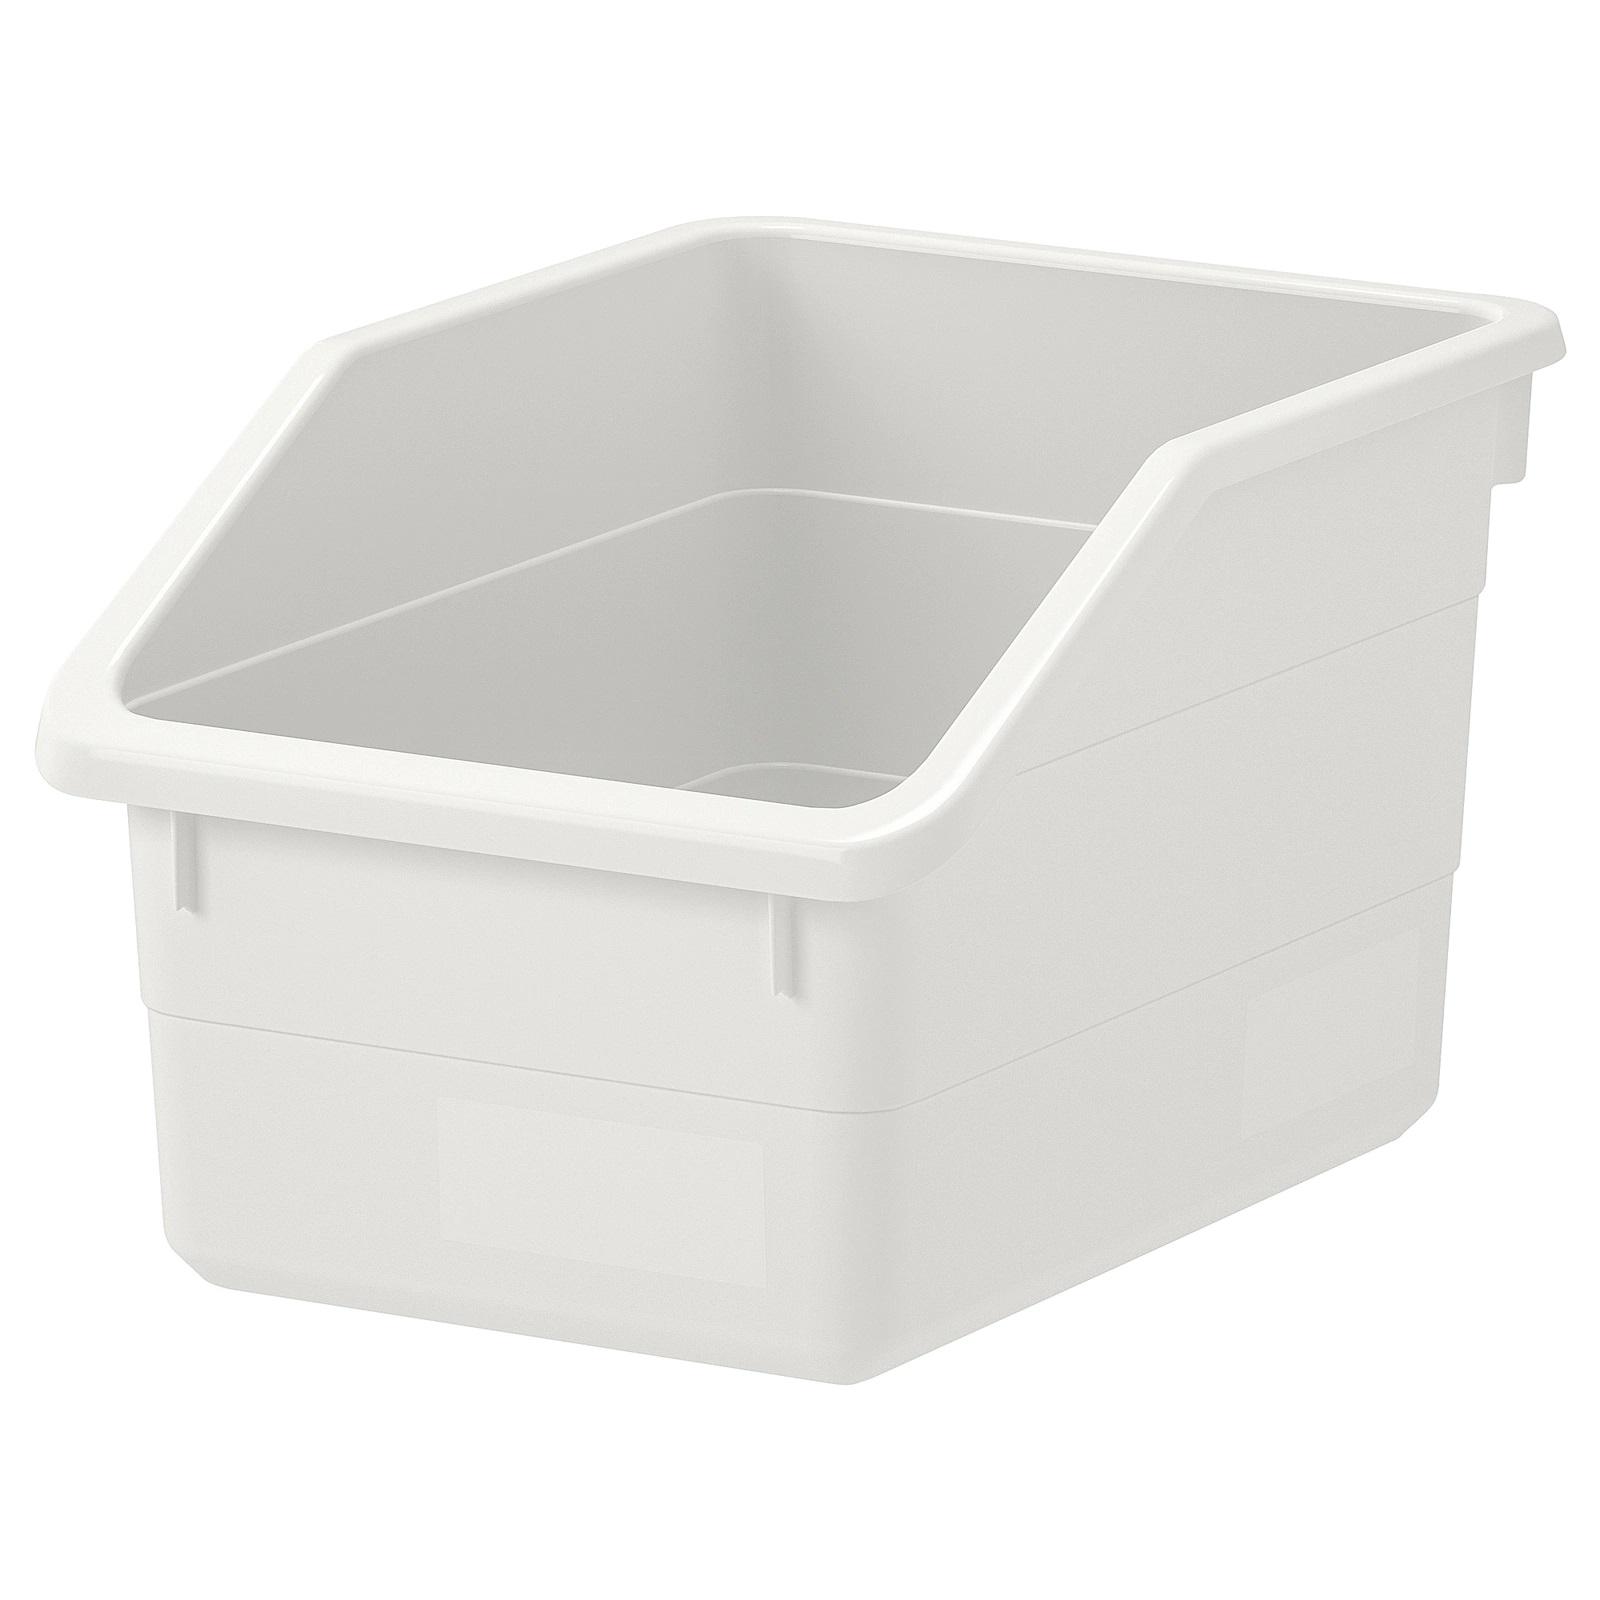 SOCKERBIT Box - white 19 x 26 x 15 cm – Storage Box IKEA – Organizer for tools, stationary, kitchen items, Crafts